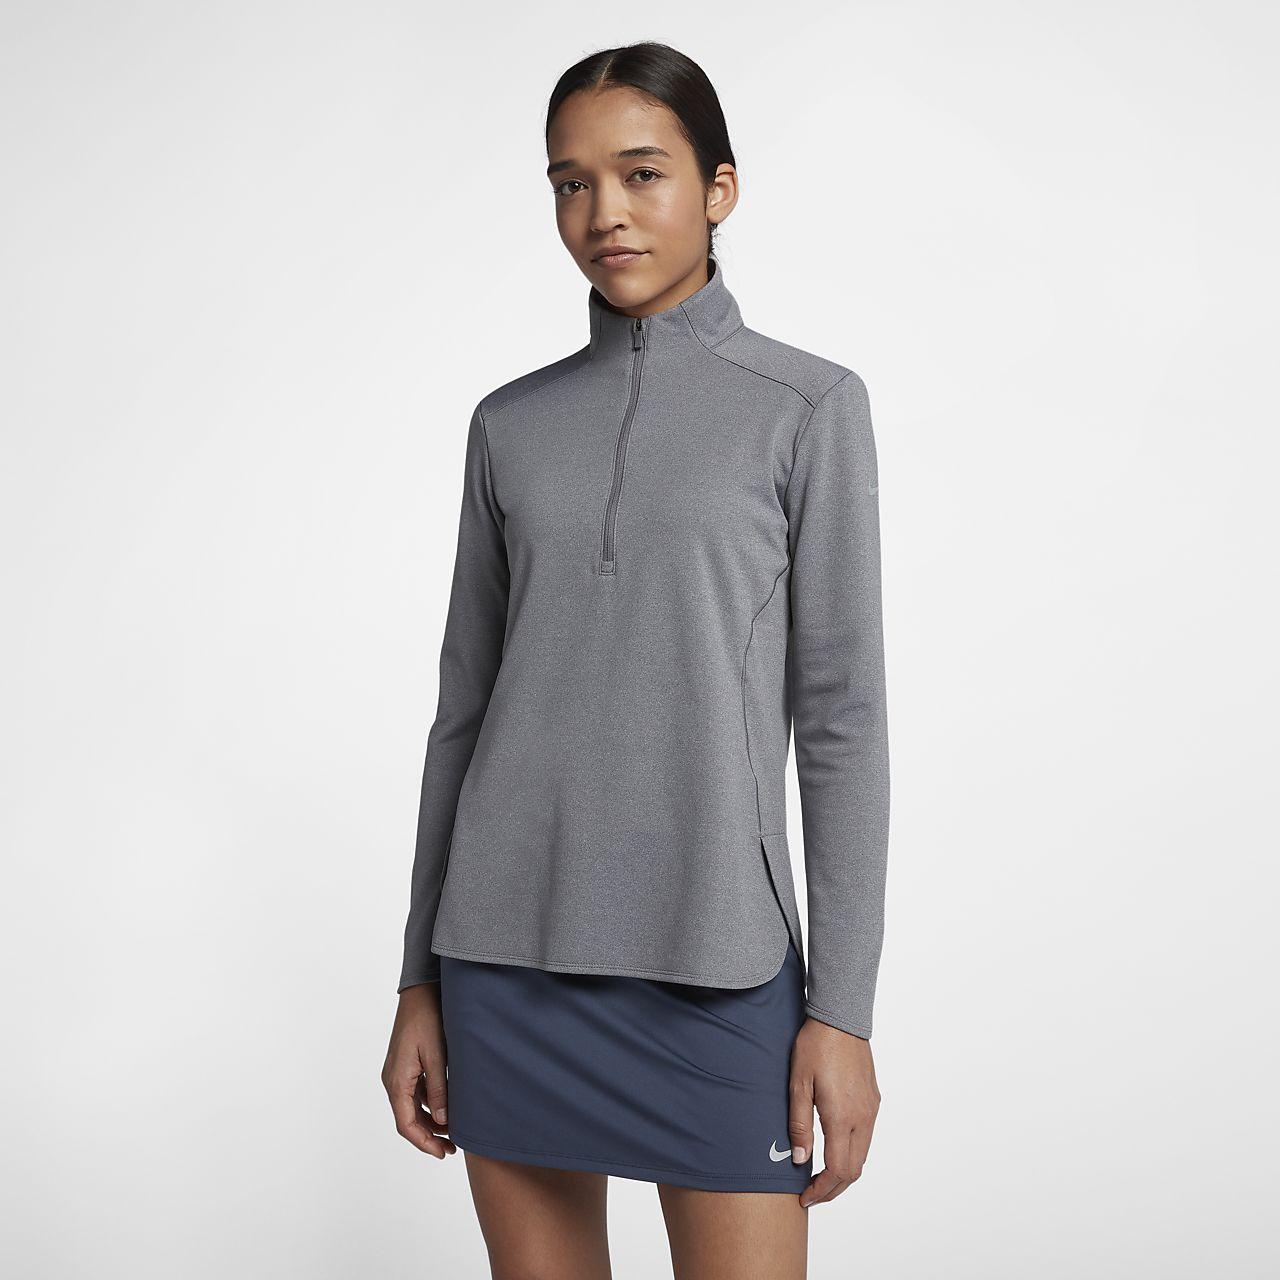 Nike Dri-FIT Women's Long-Sleeve Golf Top